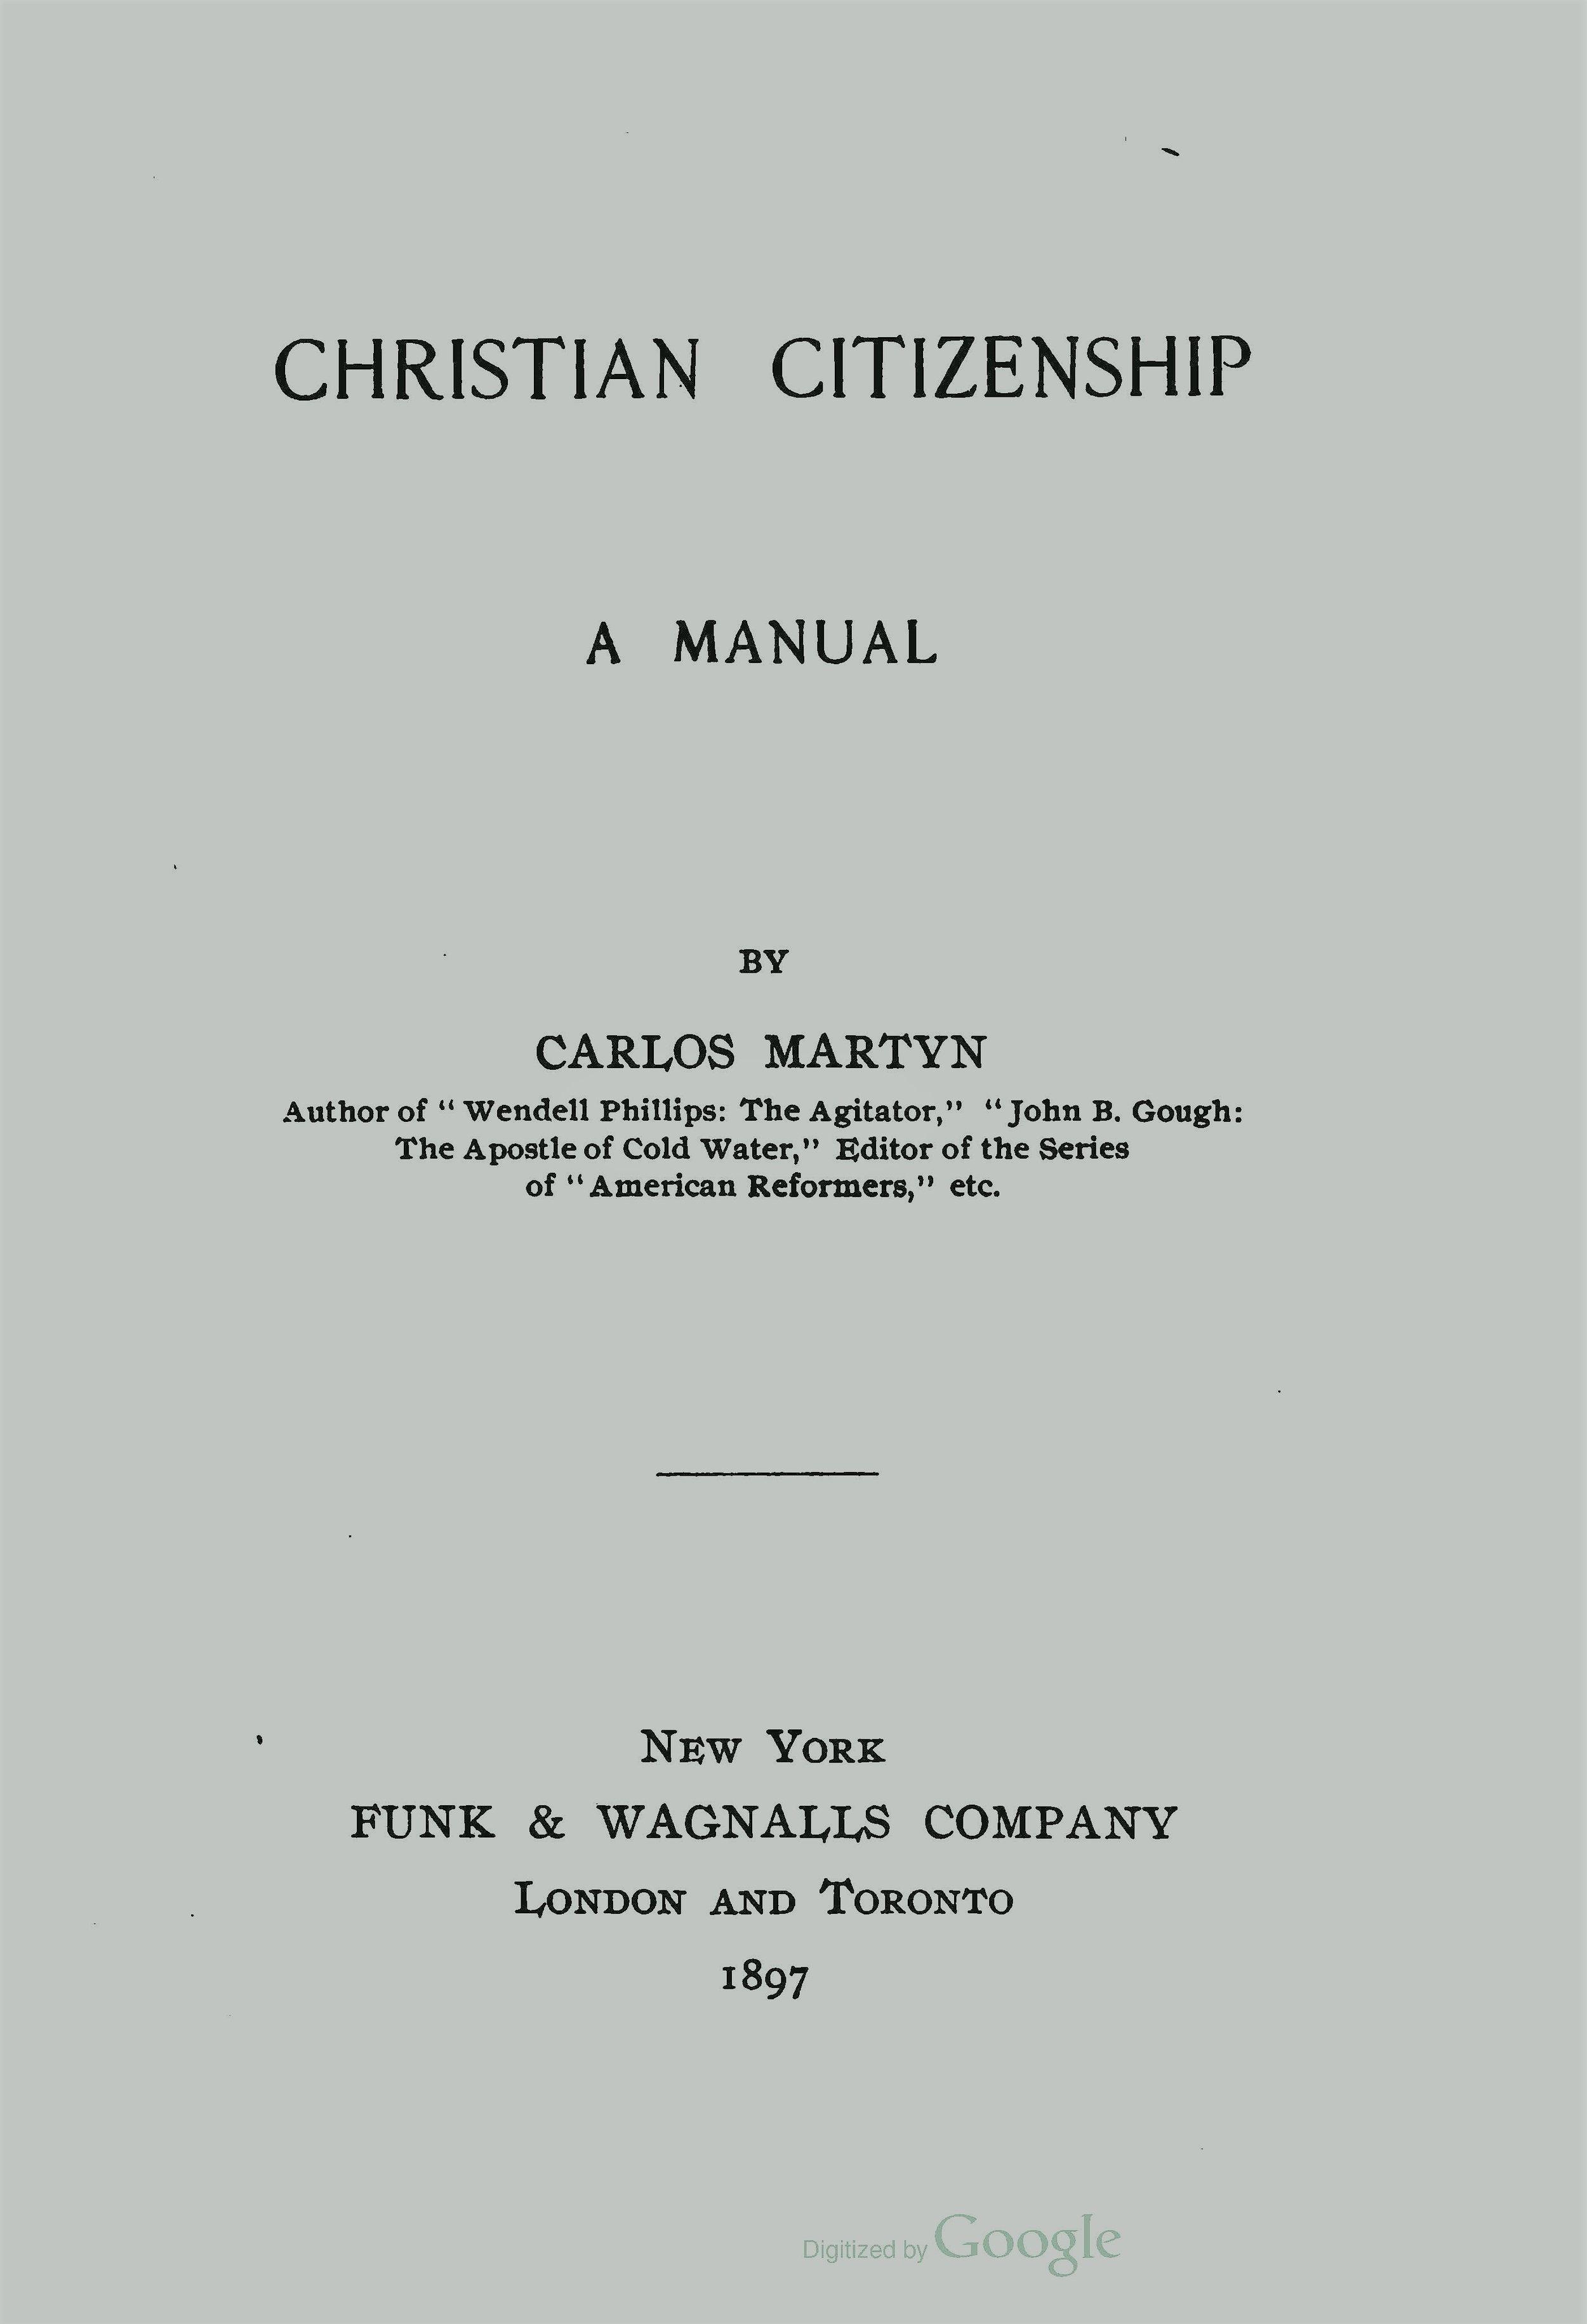 Martyn, William Carlos, Christian Citizenship A Manual Title Page.jpg